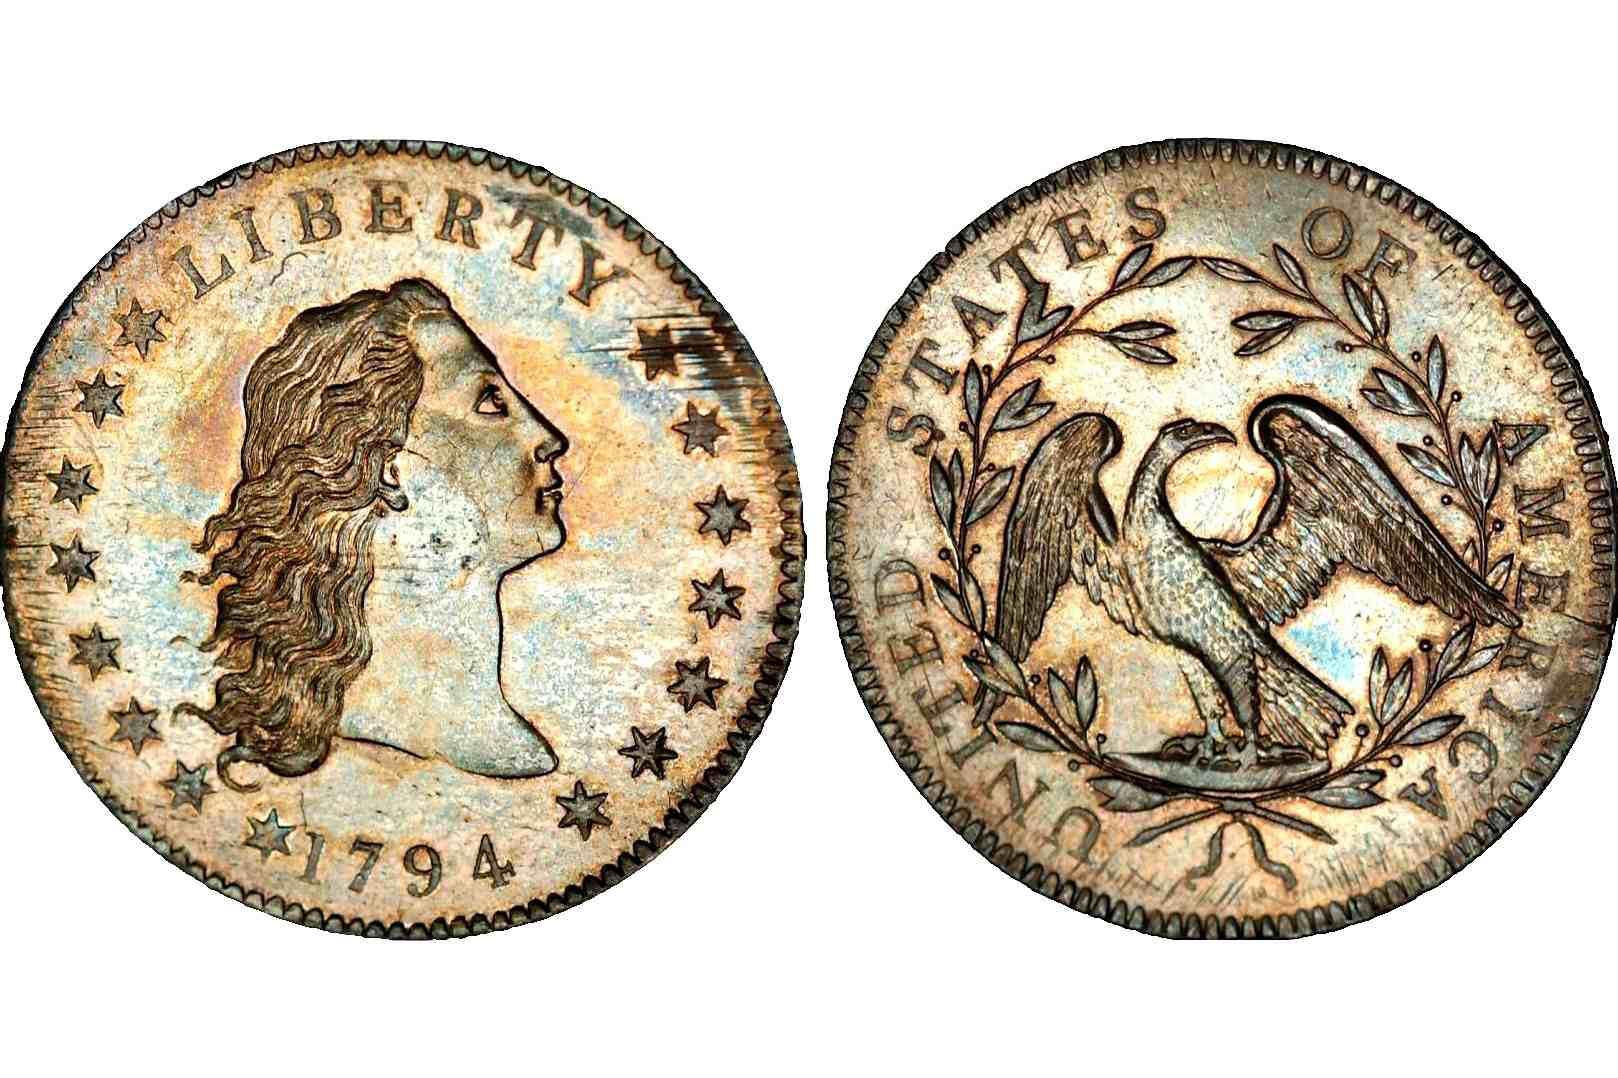 1794 Flowing Hair Silver Dollar with Silver Plug